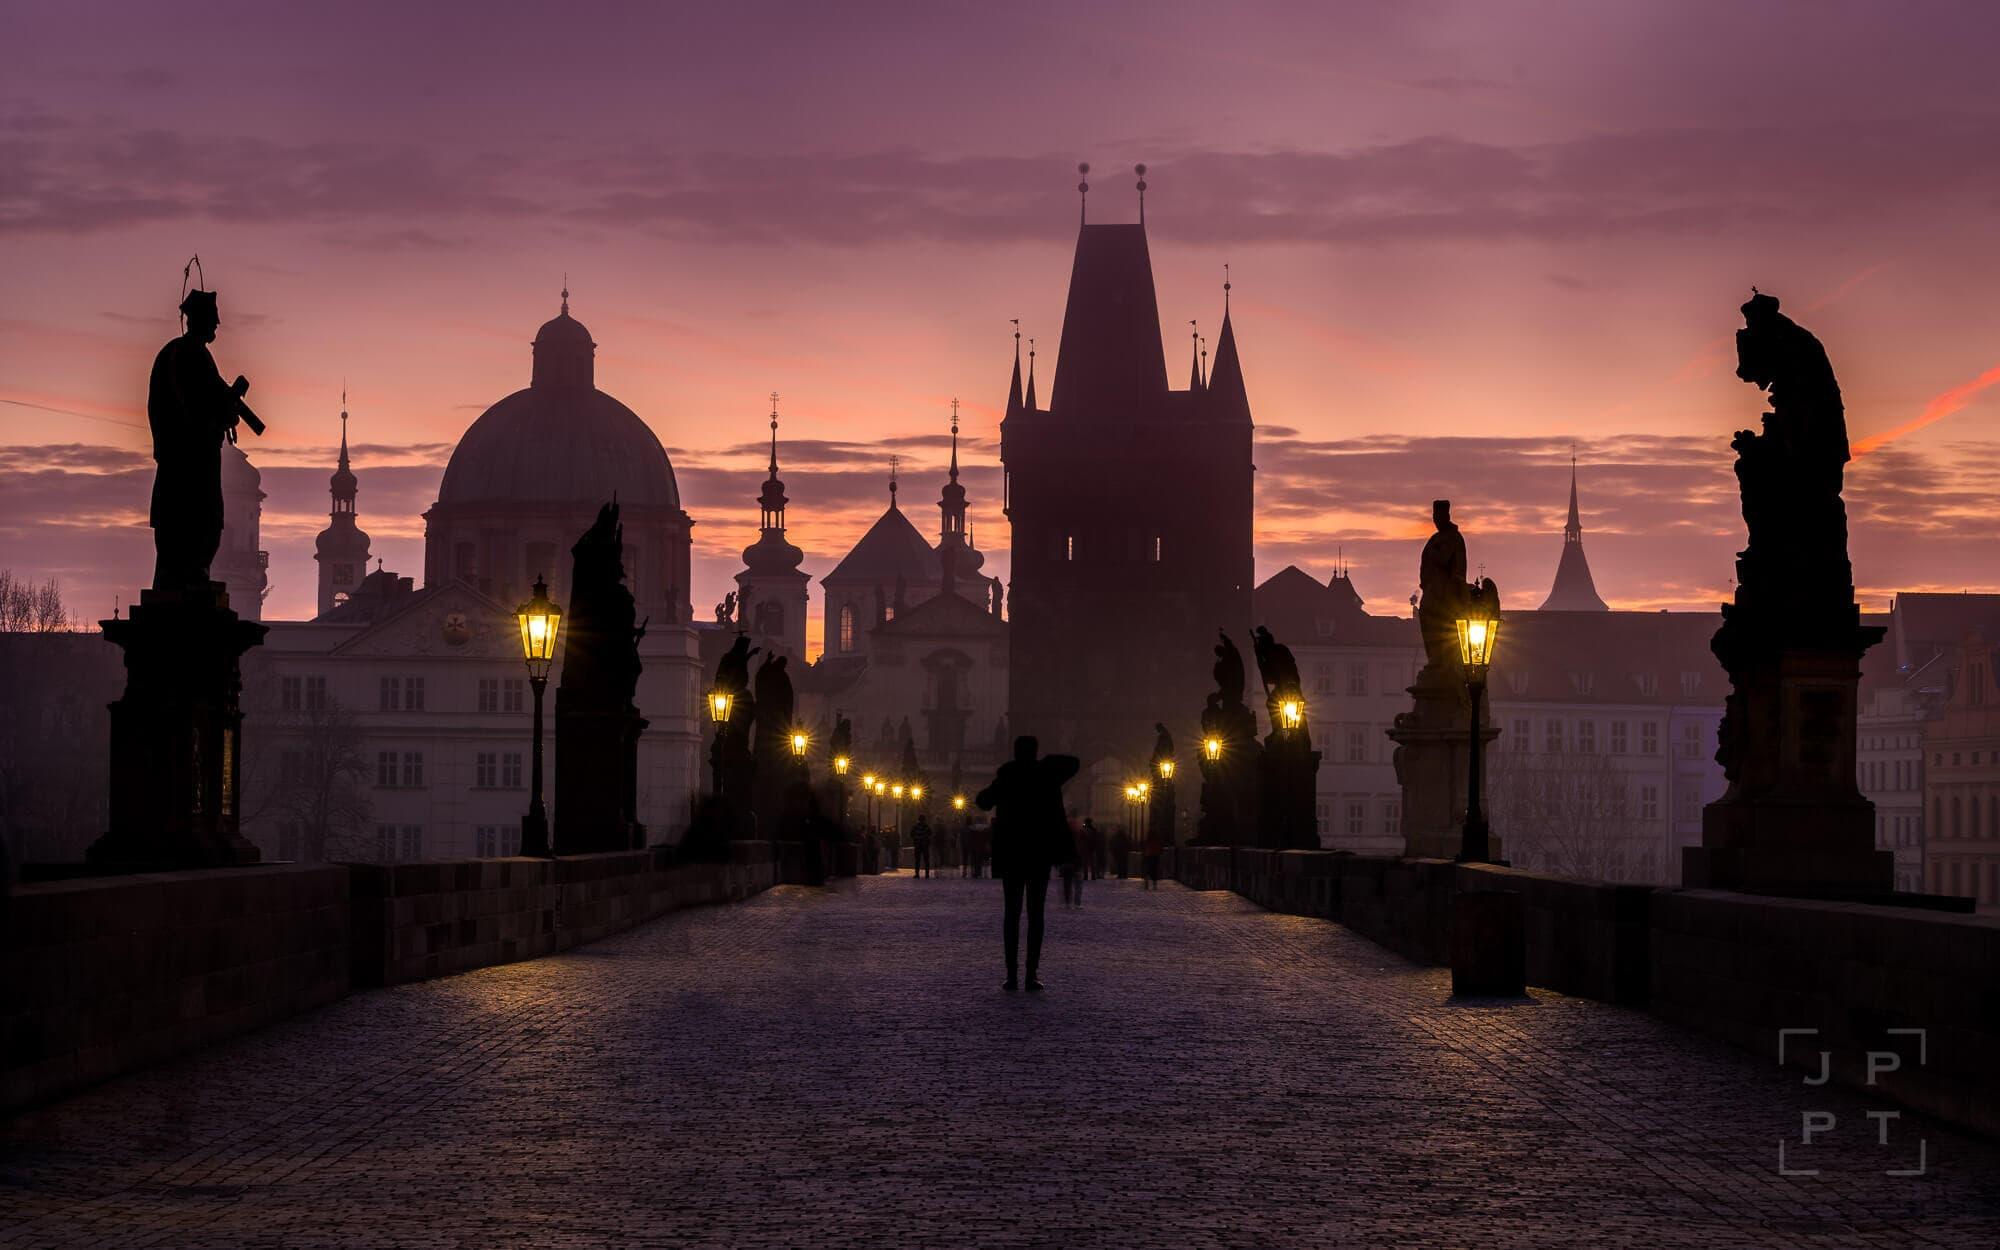 Charles bridge at sunrise with colorful sky, Prague